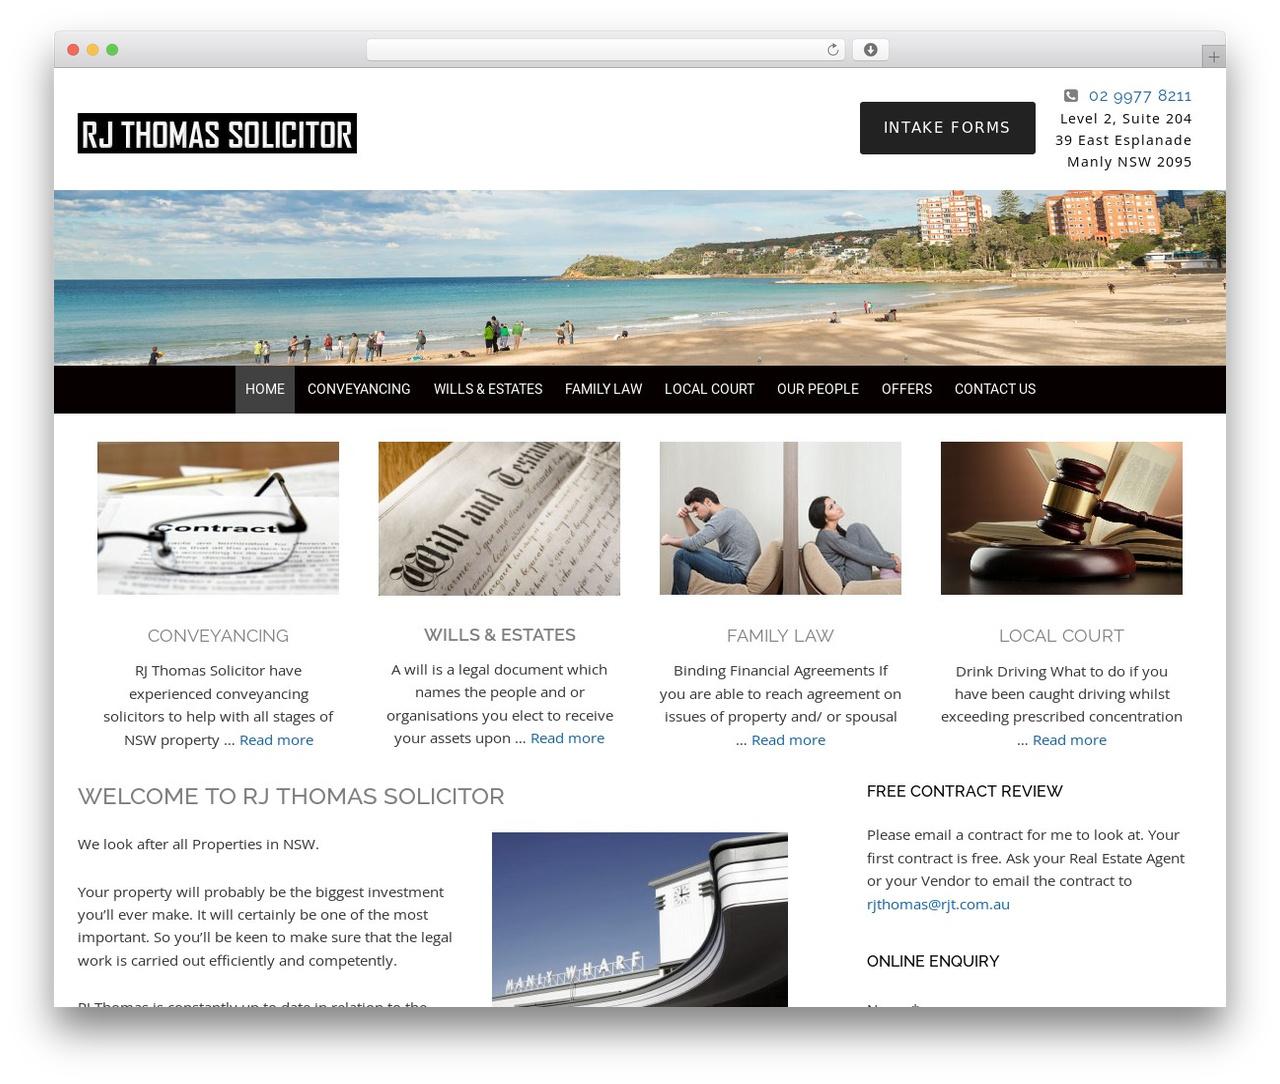 WordPress theme Minimum Pro Child 001 - solicitorsmanly.com